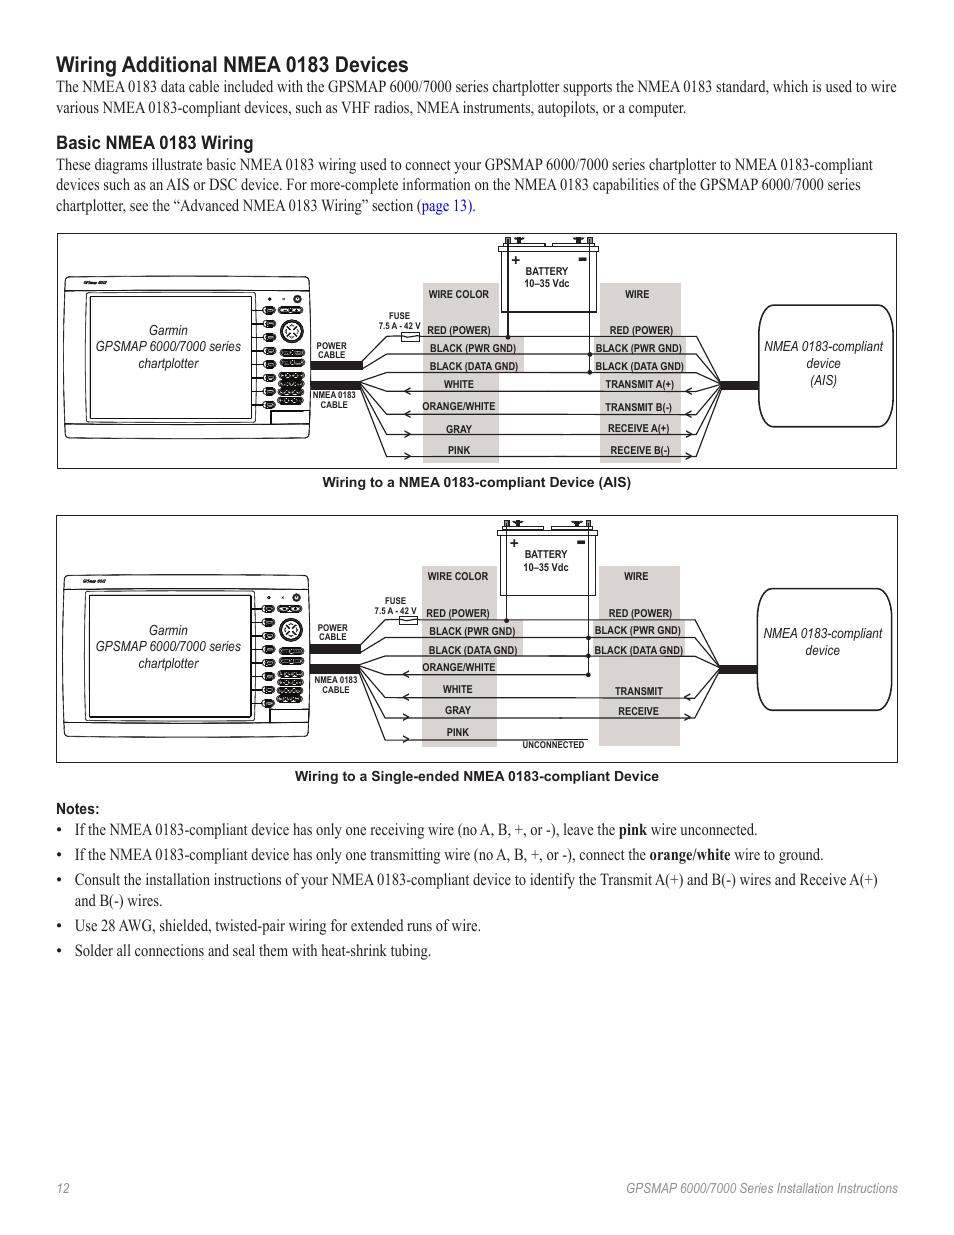 medium resolution of wiring additional nmea 0183 devices basic nmea 0183 wiring garmin gpsmap 7000 series user manual page 12 20